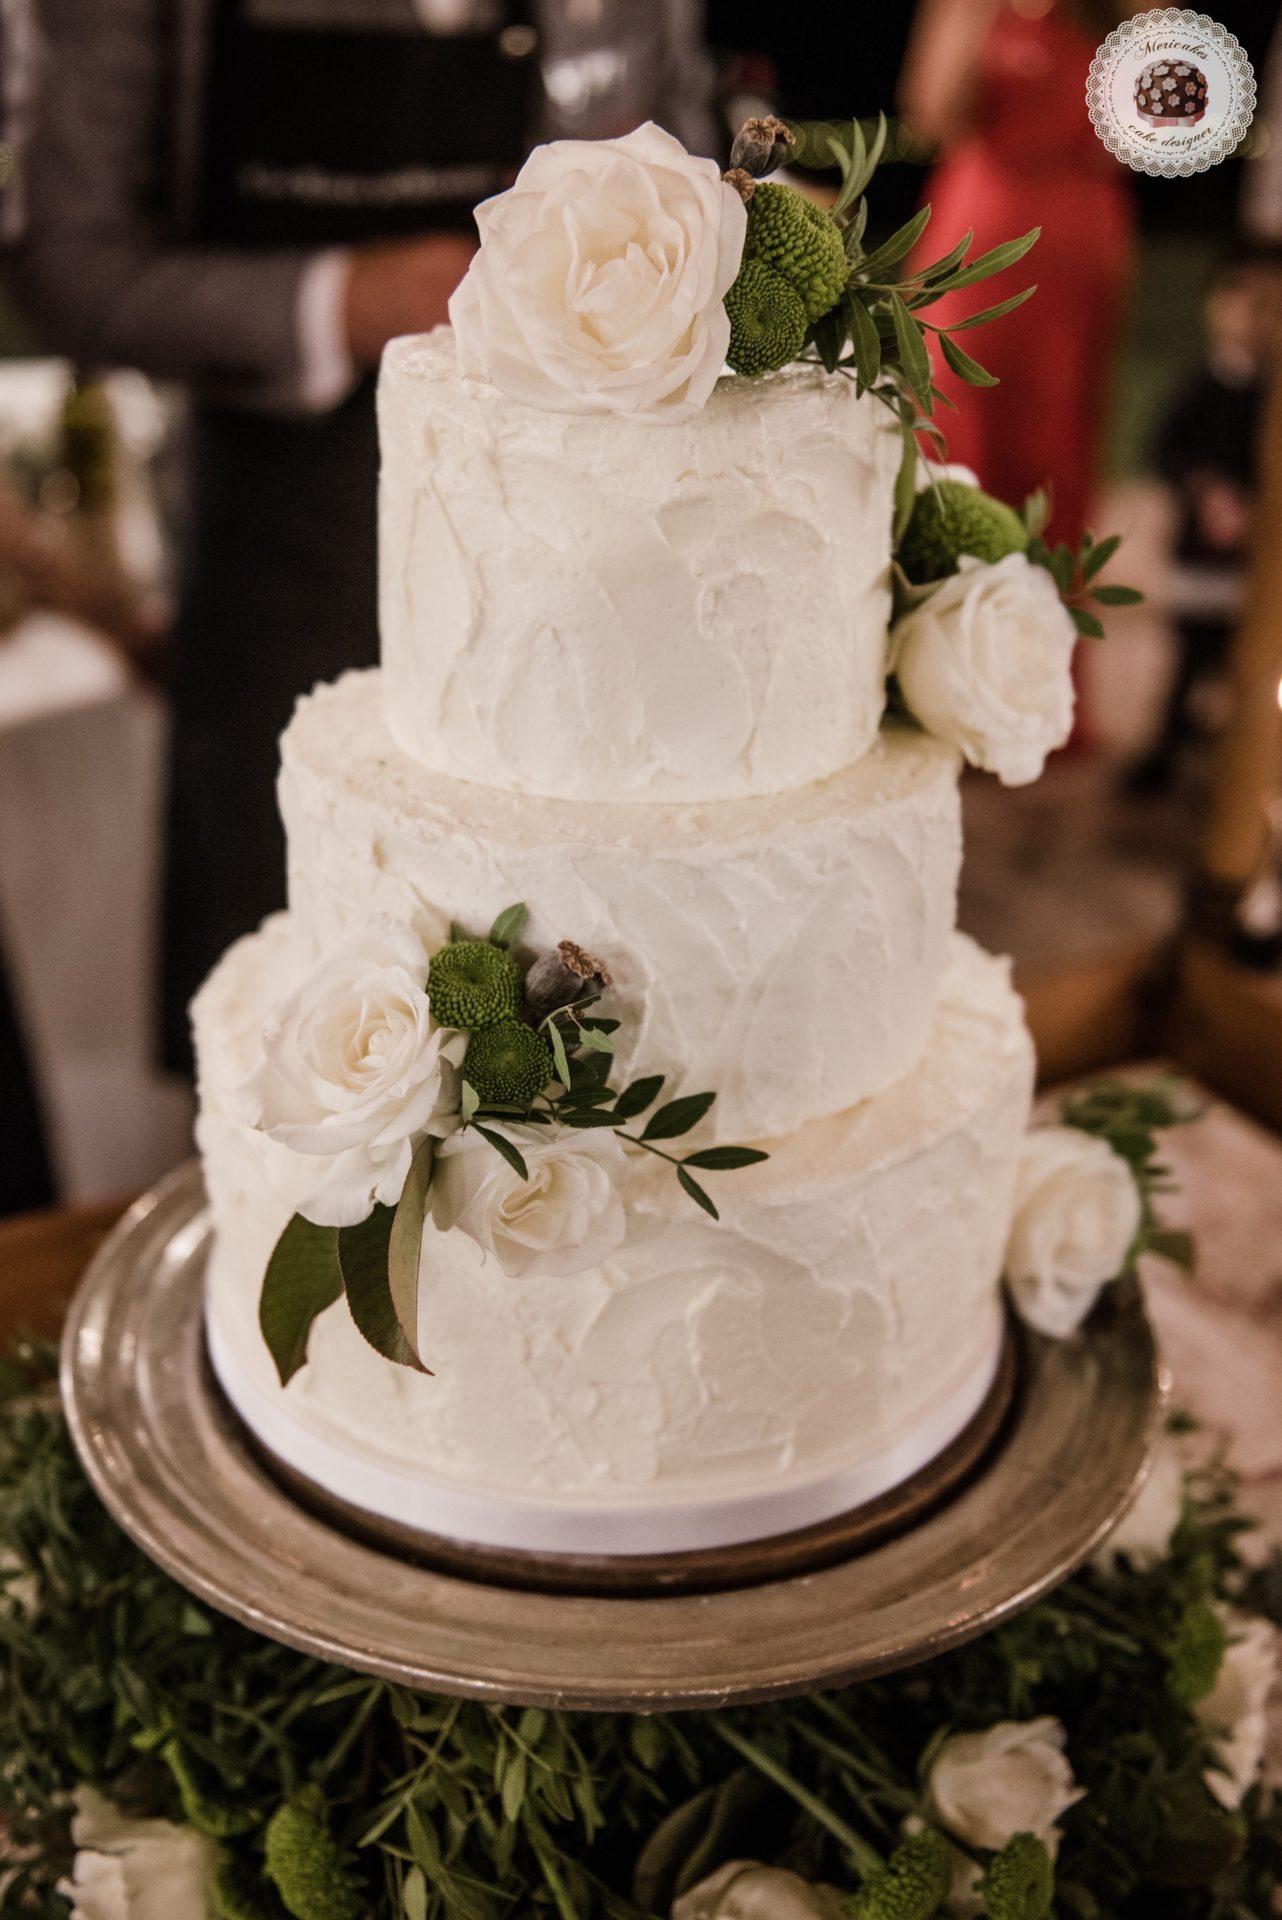 Wedding cake, cream cake, rustic cake, can ribas, Visual foto, mericakes, flowers cake, spain wedding, roses, pistachio, raspberry